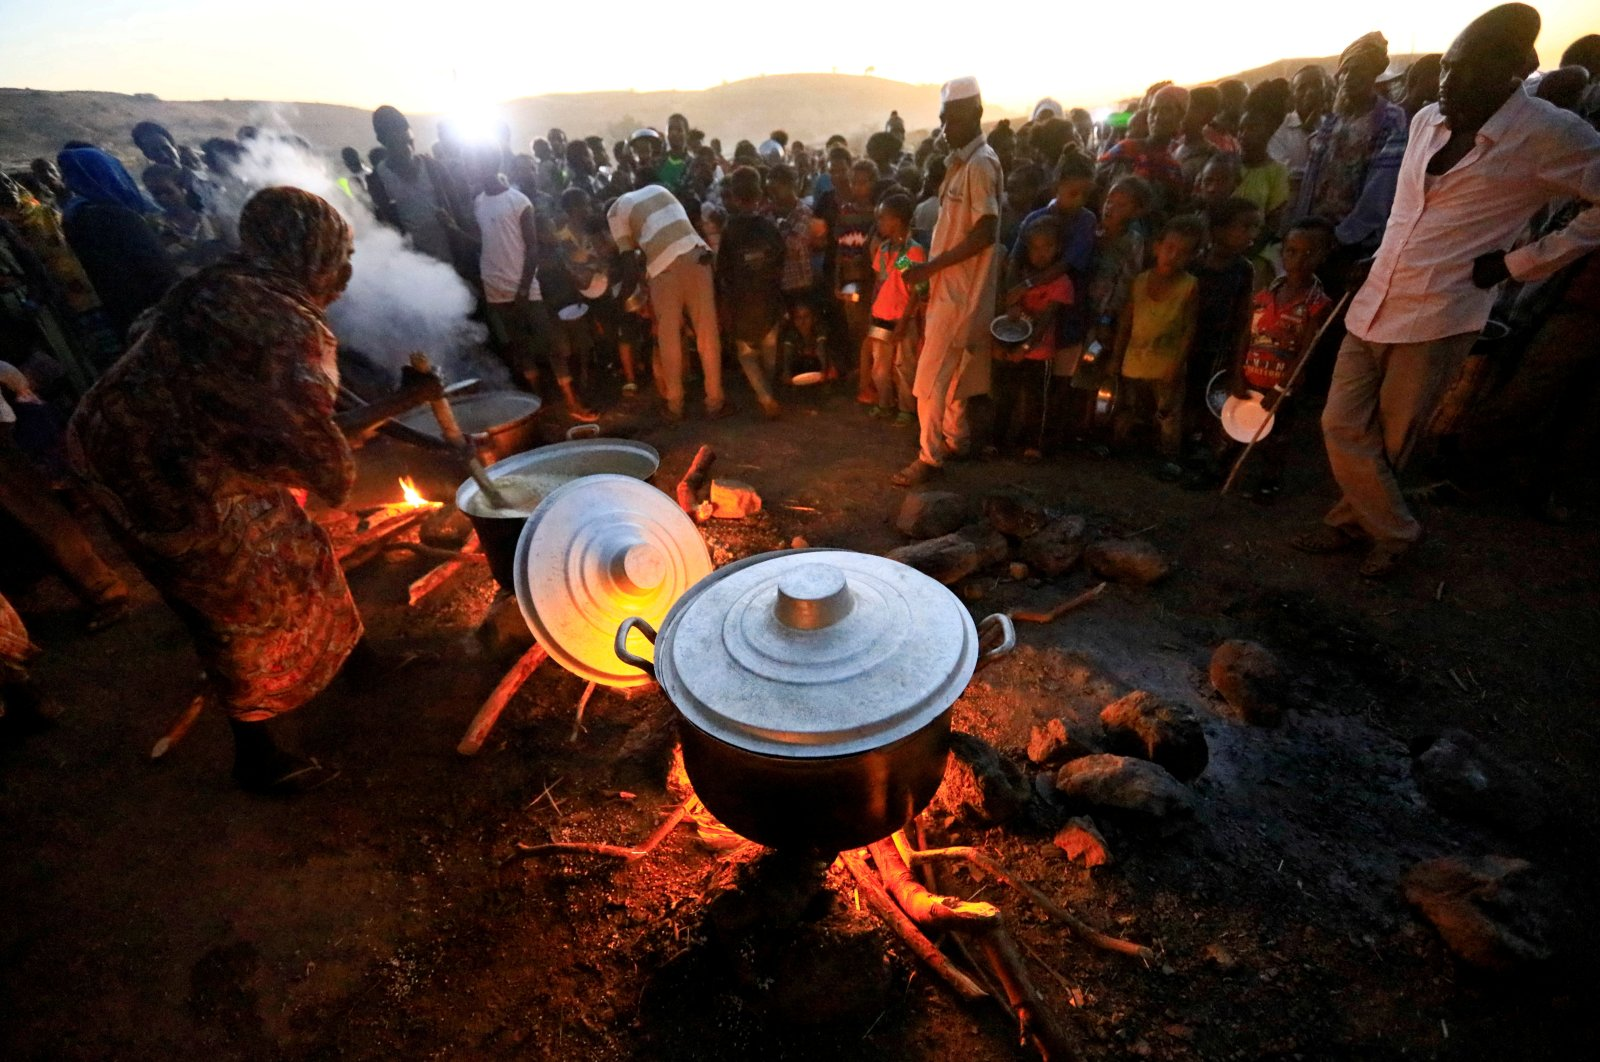 Ethiopian refugees fleeing from the fighting in Tigray region, wait for food at the Um Rakoba camp, on the Sudan-Ethiopia border, in al-Qadarif state, Sudan November 23, 2020. (Reuters Photo)